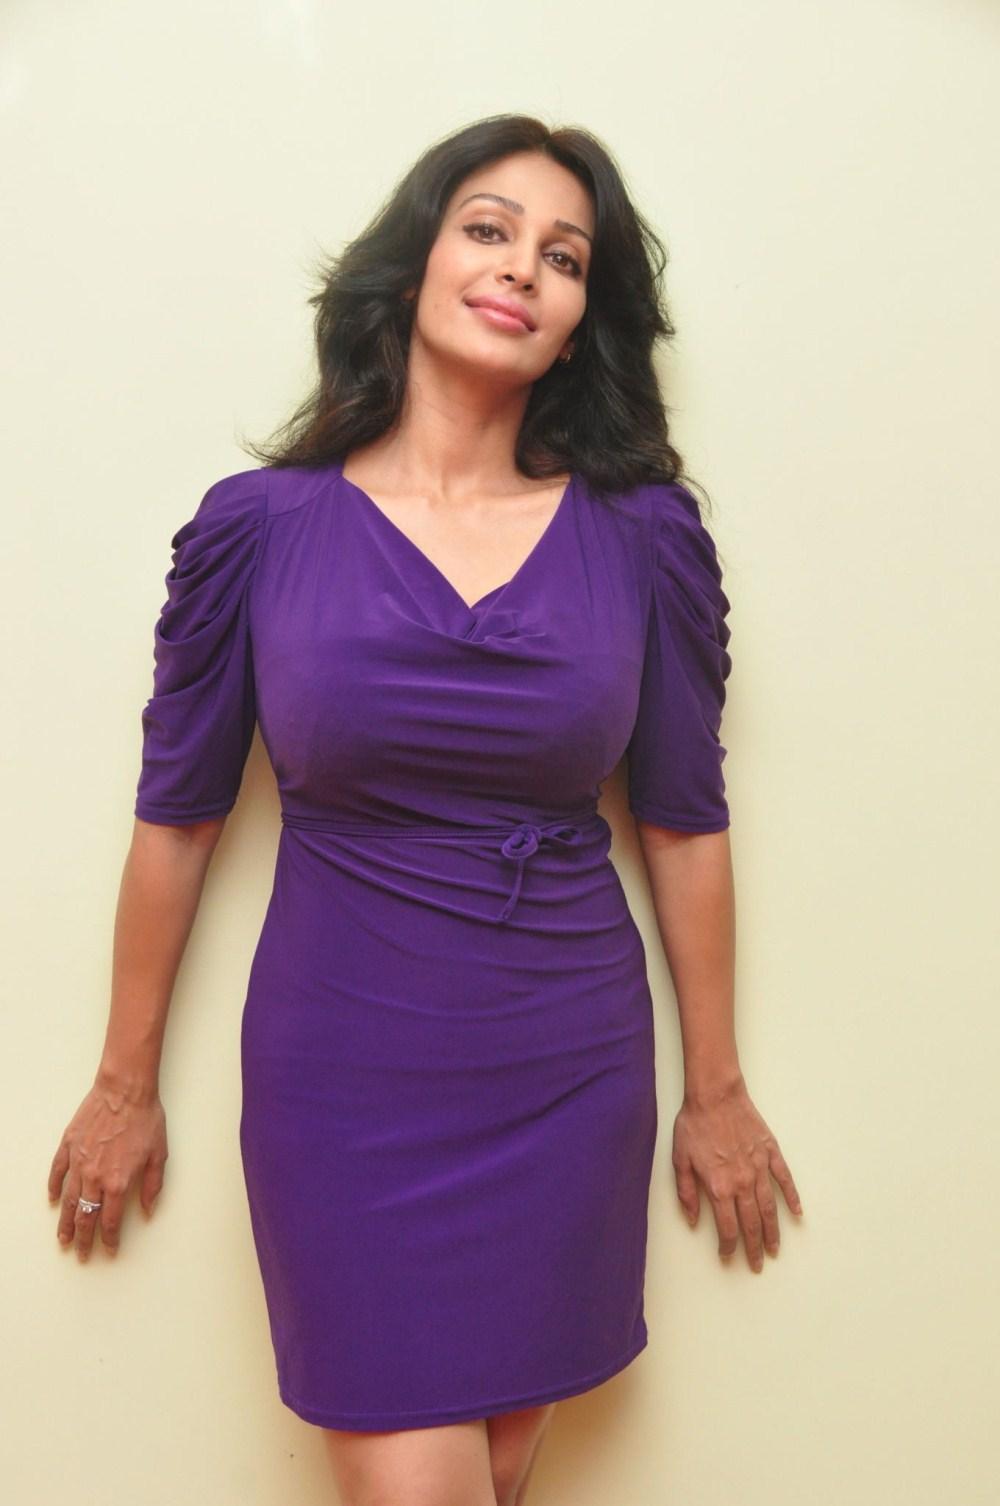 Asha Saini | Asha Saini Photo Gallery, Videos, Fanclub